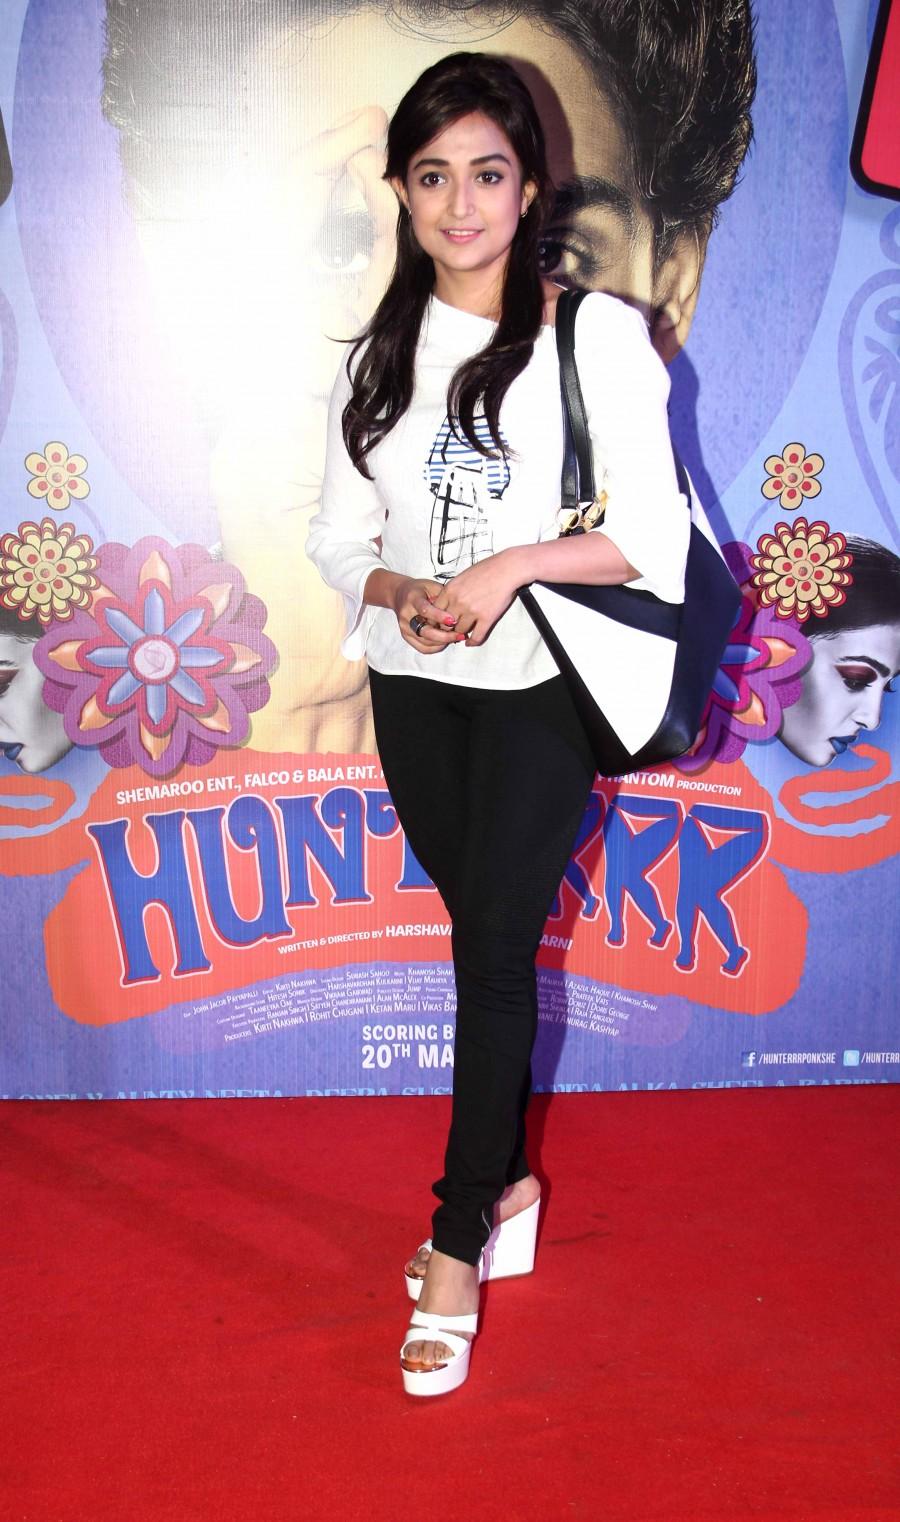 Hunterrr,Gulshan Devaiah,Rajkumar Hirani,Radhika Apte,special screening,Richa Chadda,photos